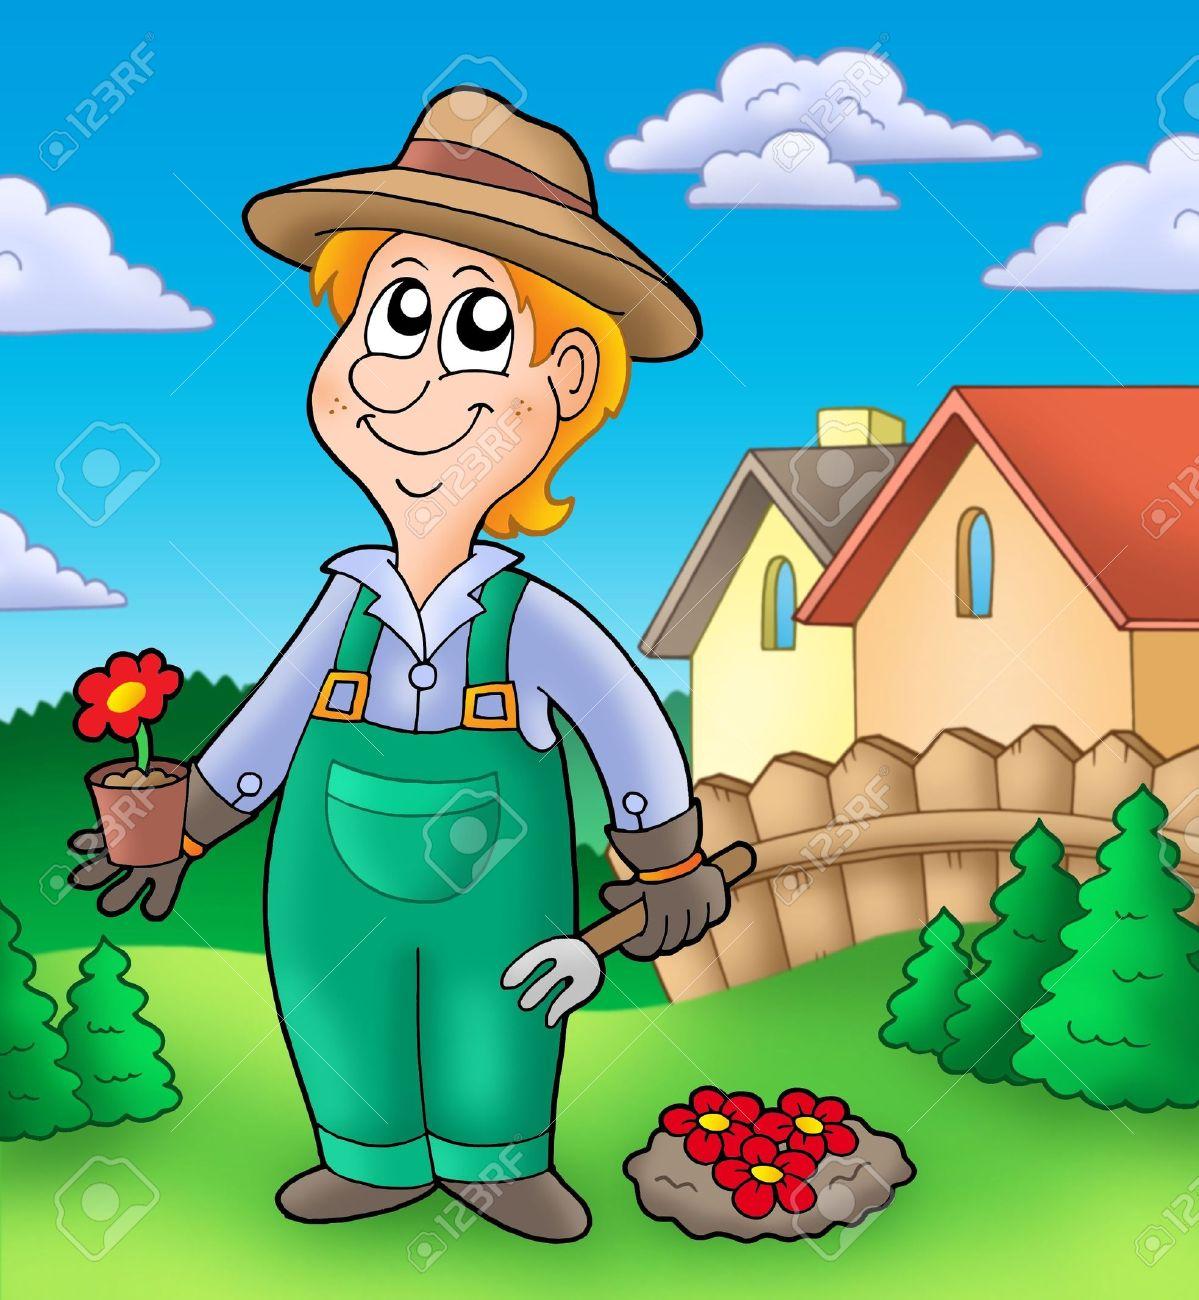 Gardener planting red flowers - color illustration. Stock Illustration - 6839664